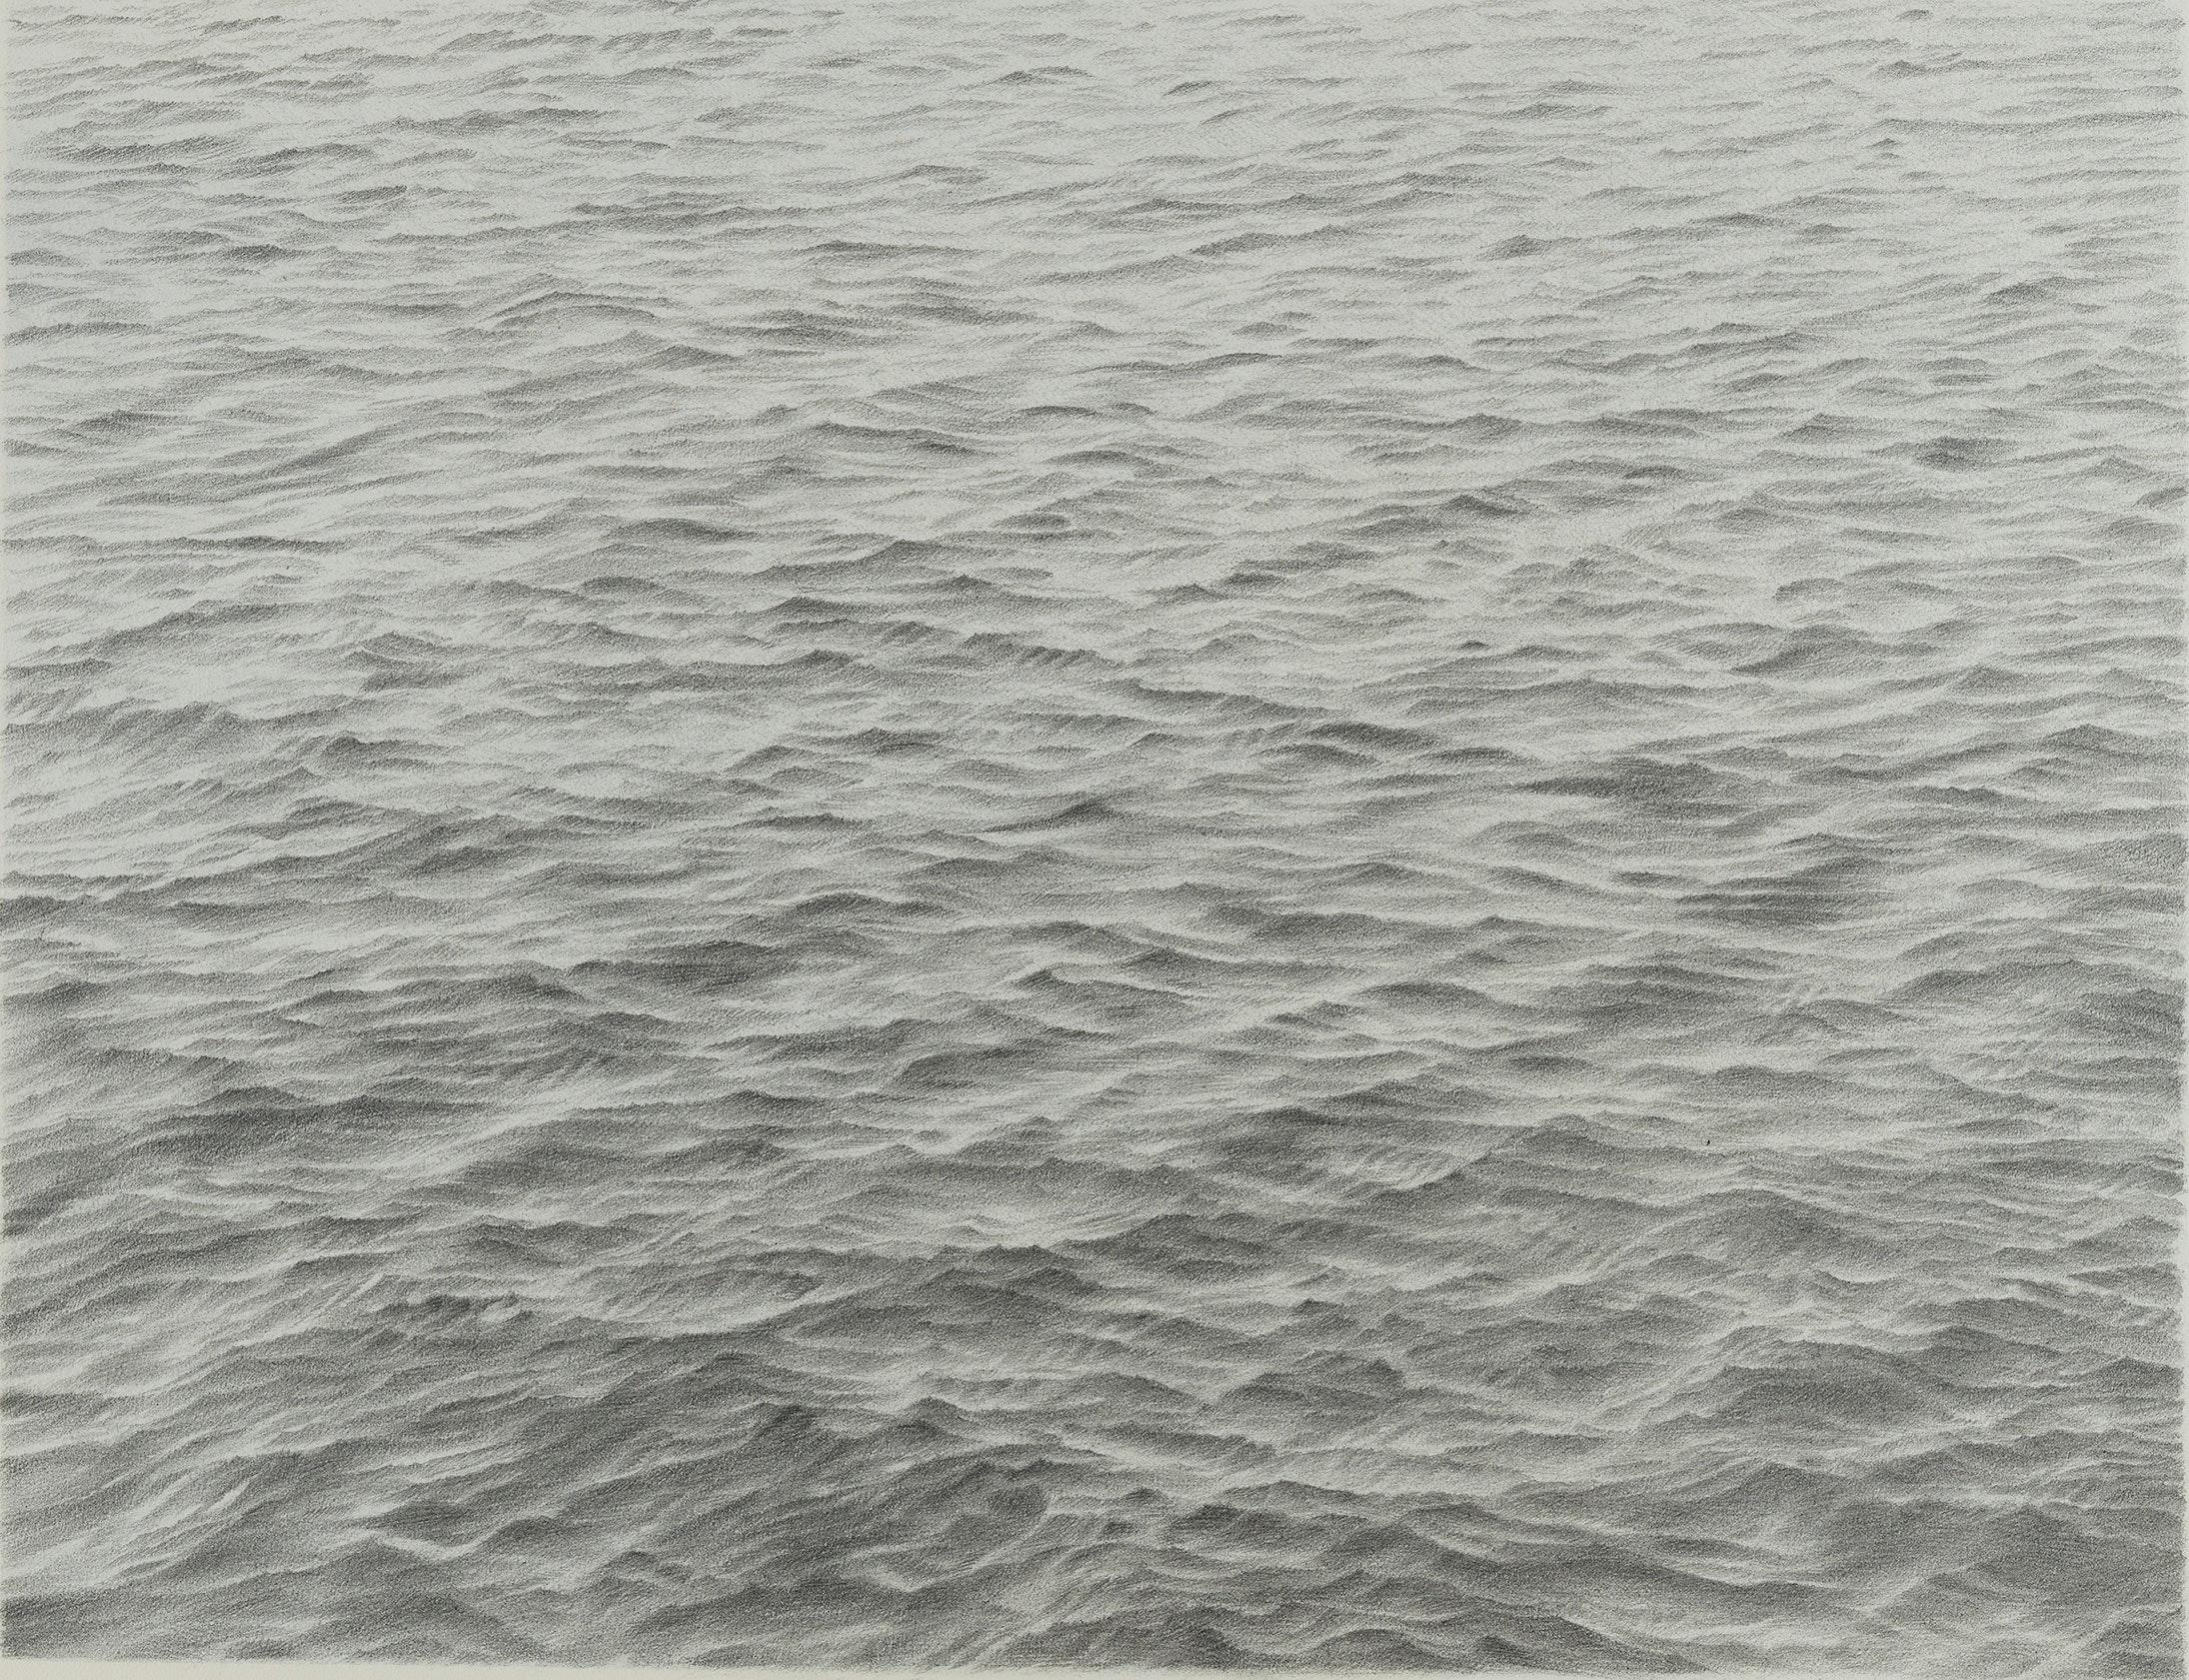 Vija Celmins, <em>Untitled (Ocean)</em>, 1973. Graphite on paper, 11 1/2 x 14 3/4 inches. © Vija Celmins. Courtesy the artist and Matthew Marks Gallery.